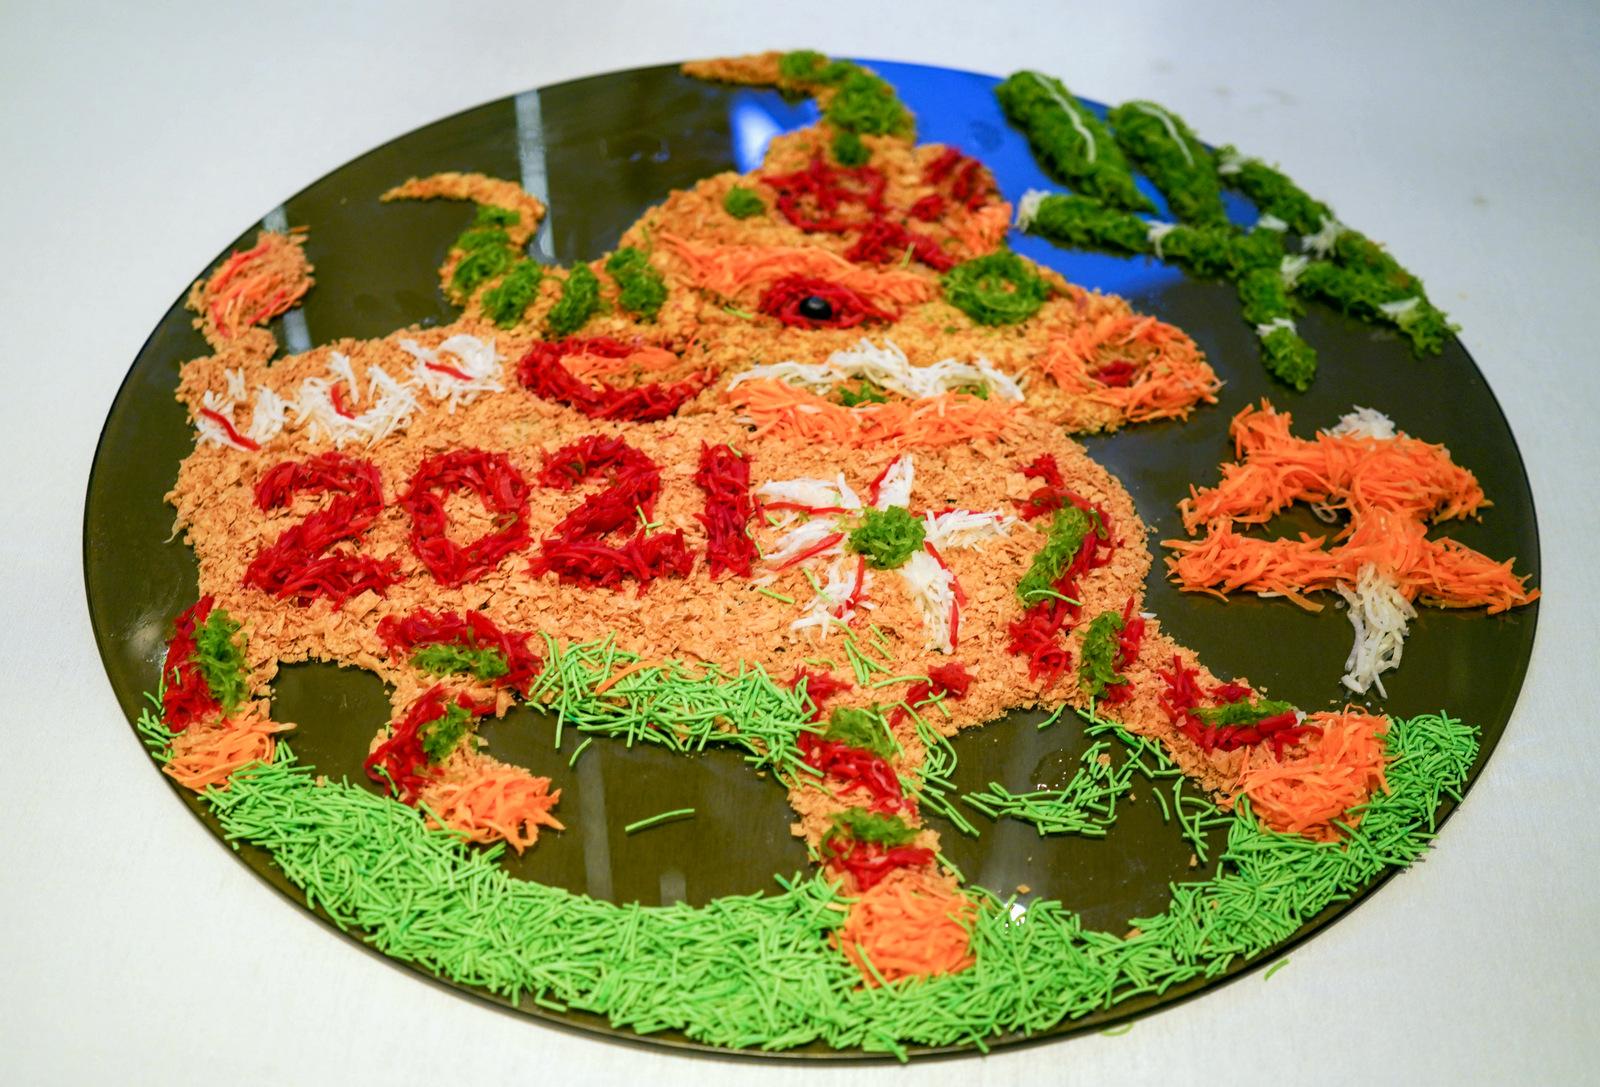 aloft kuala lumpur sentral: lunar new year trio of yee sang, roast duck & chicken